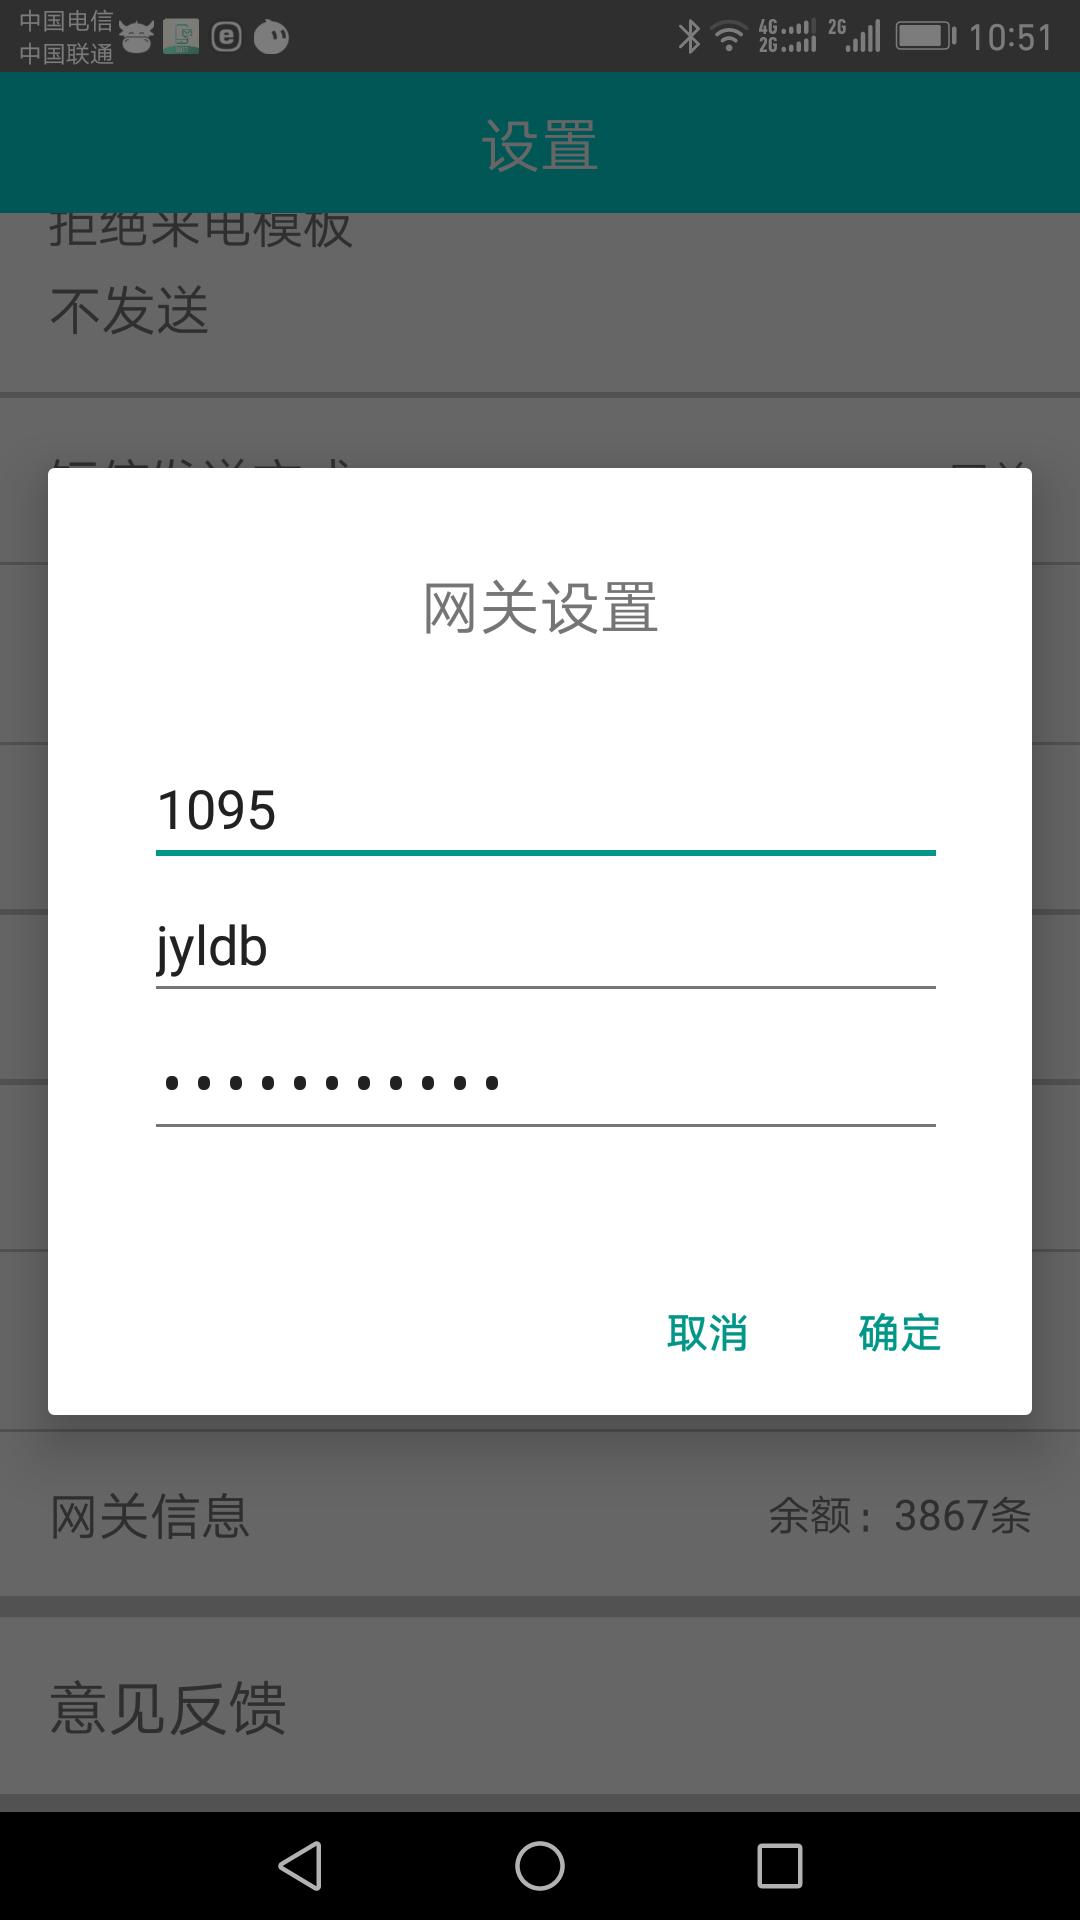 Screenshot_20170218-105115.png